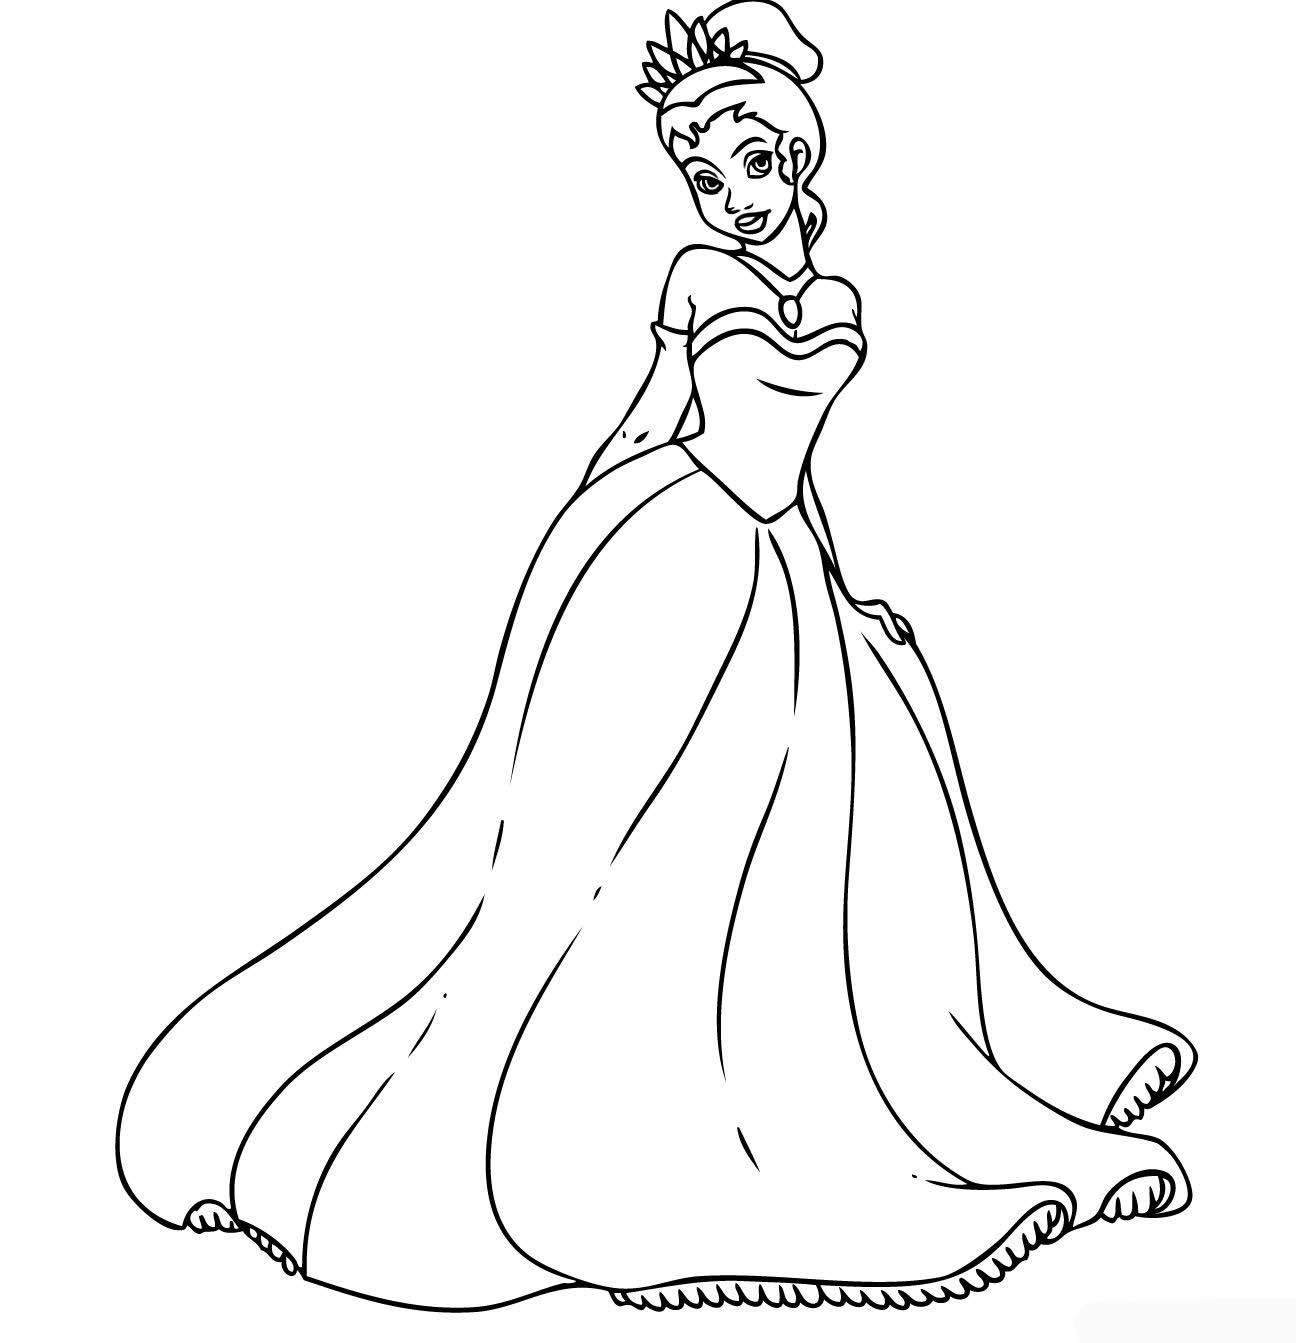 Princess coloring pages online games - Princess Coloring Pages Online Games Disney Princess Coloring Pages Free Online Games